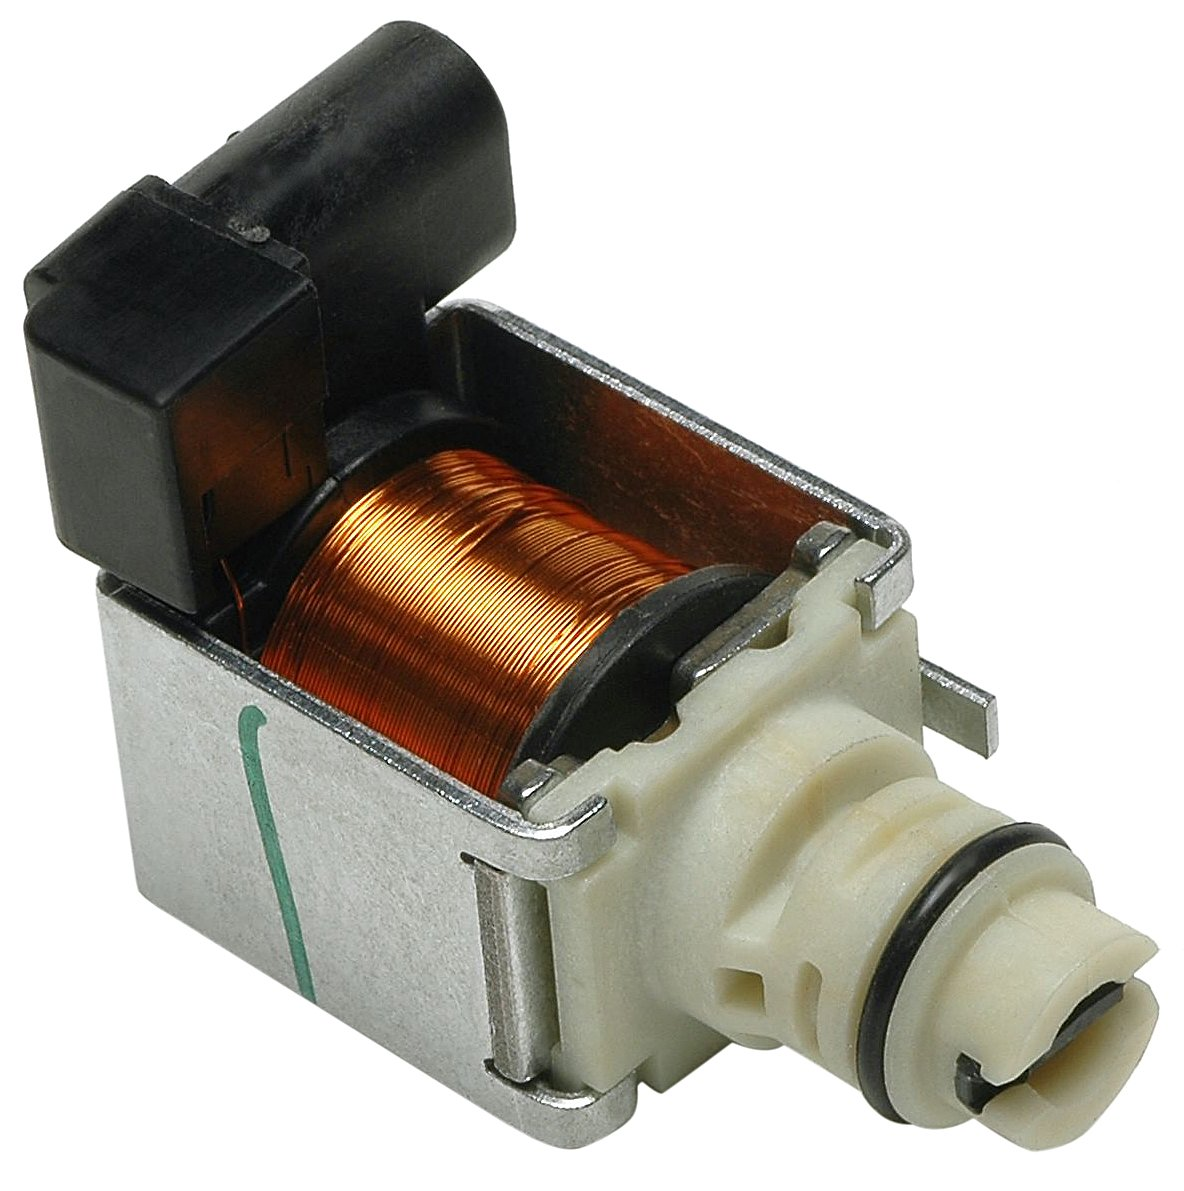 Delphi SL10020 Automatic Transmission Solenoid